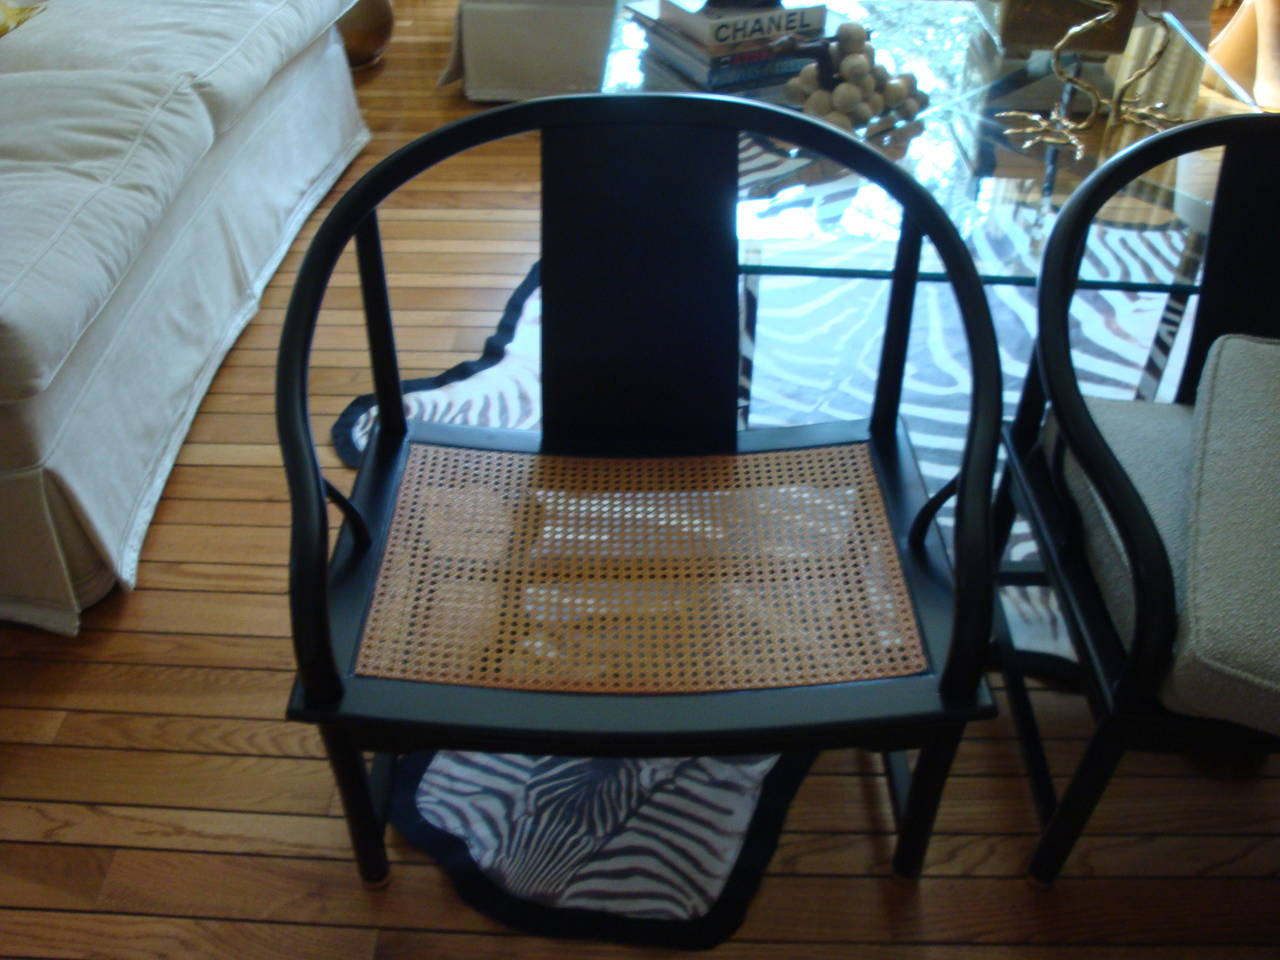 Stupendous Mid Century Modern Baker Asian Style Caned Chairs At 1Stdibs Spiritservingveterans Wood Chair Design Ideas Spiritservingveteransorg